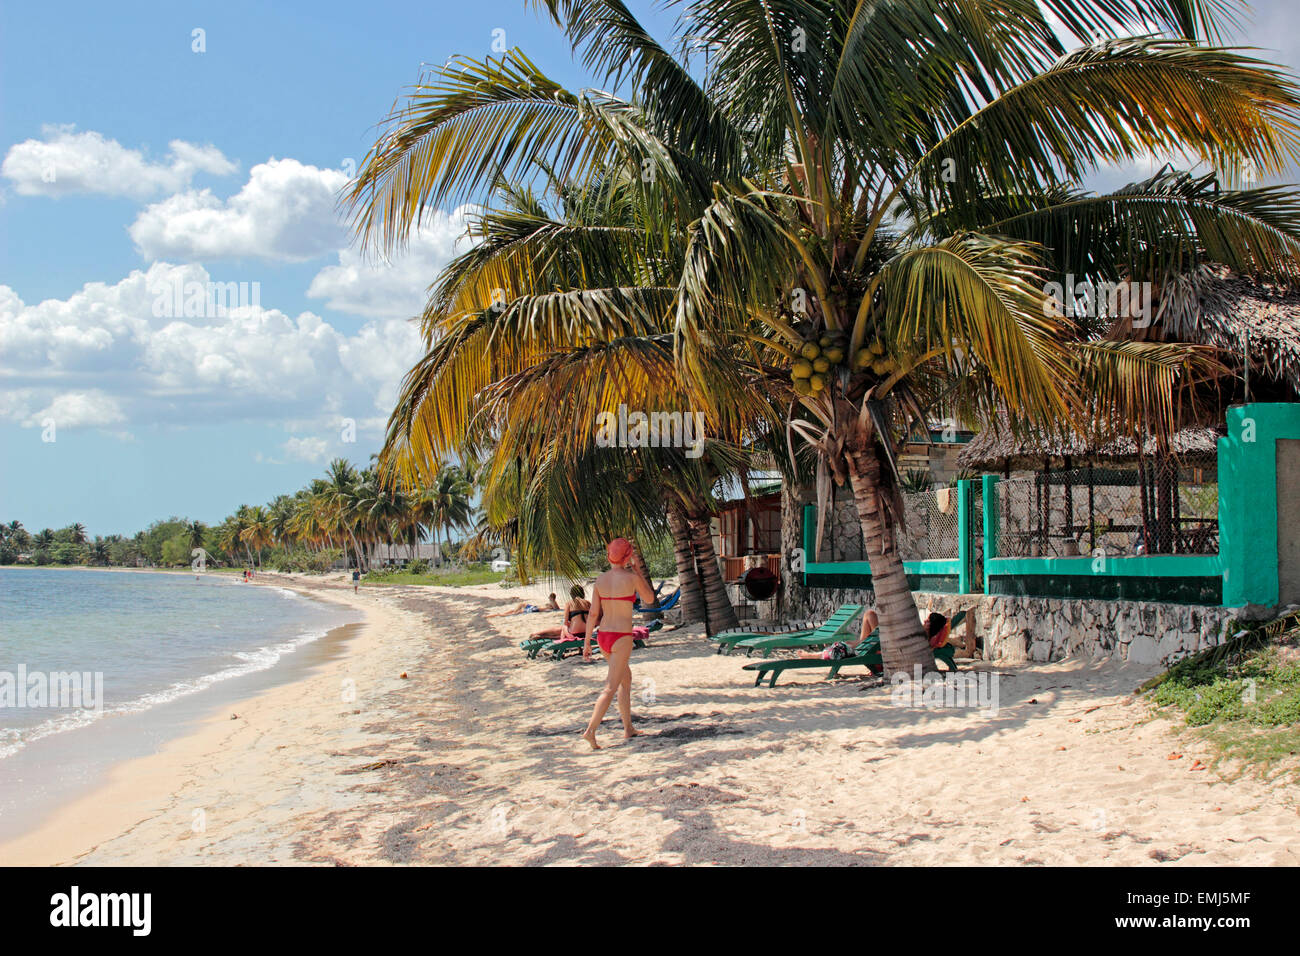 Beach on the 'Bay of Pigs' Zapata Peninsula Cuba - Stock Image